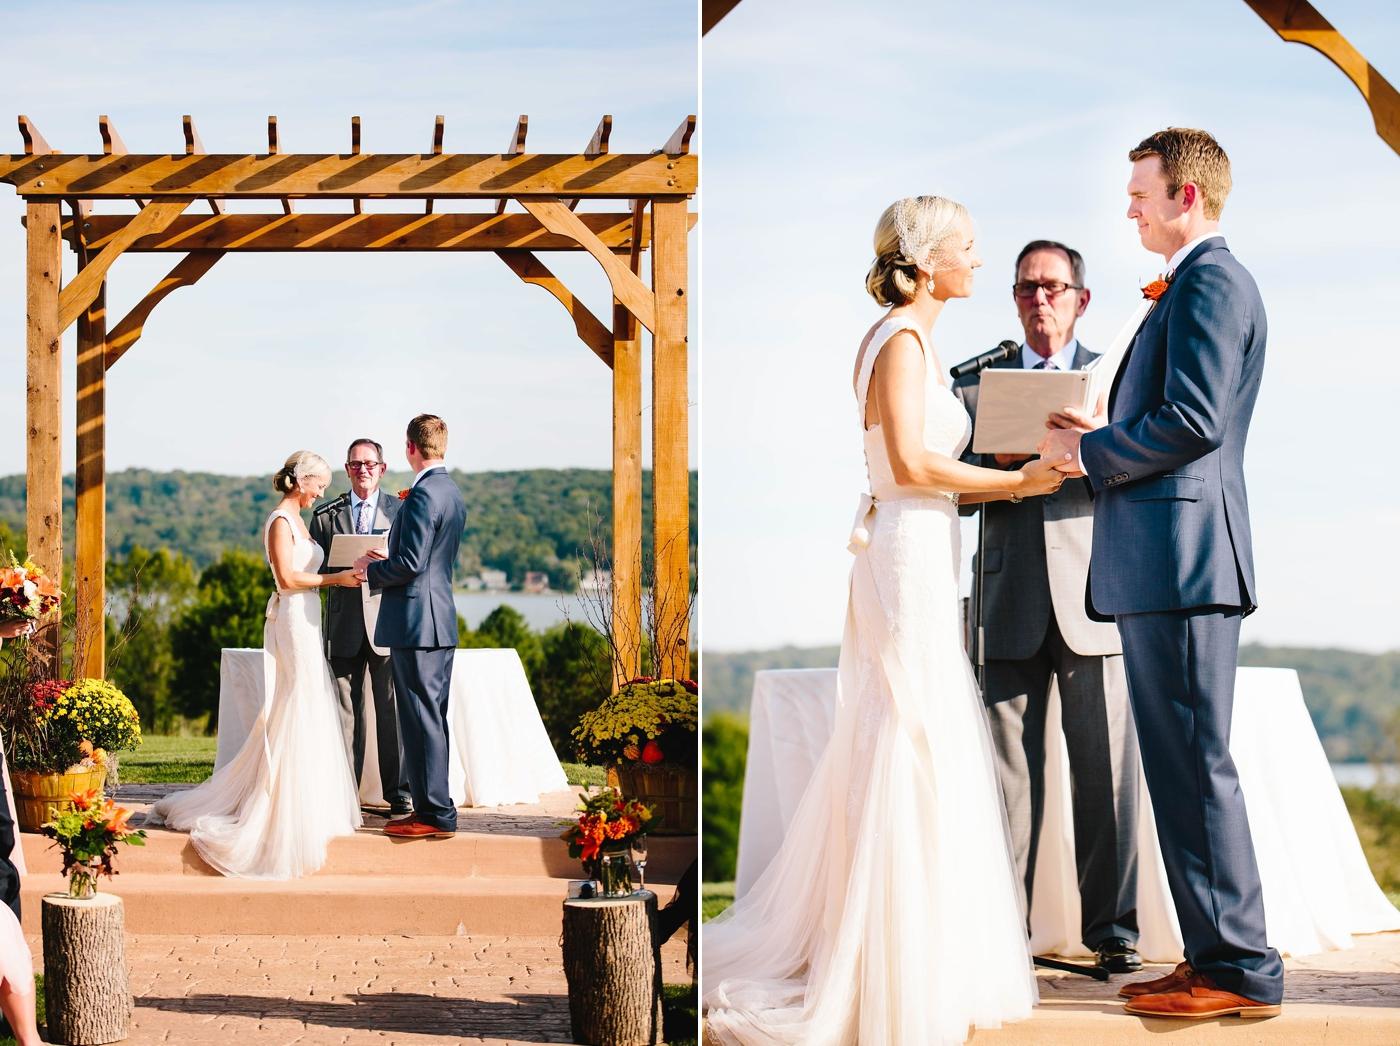 chicago-fine-art-wedding-photography-saylor24